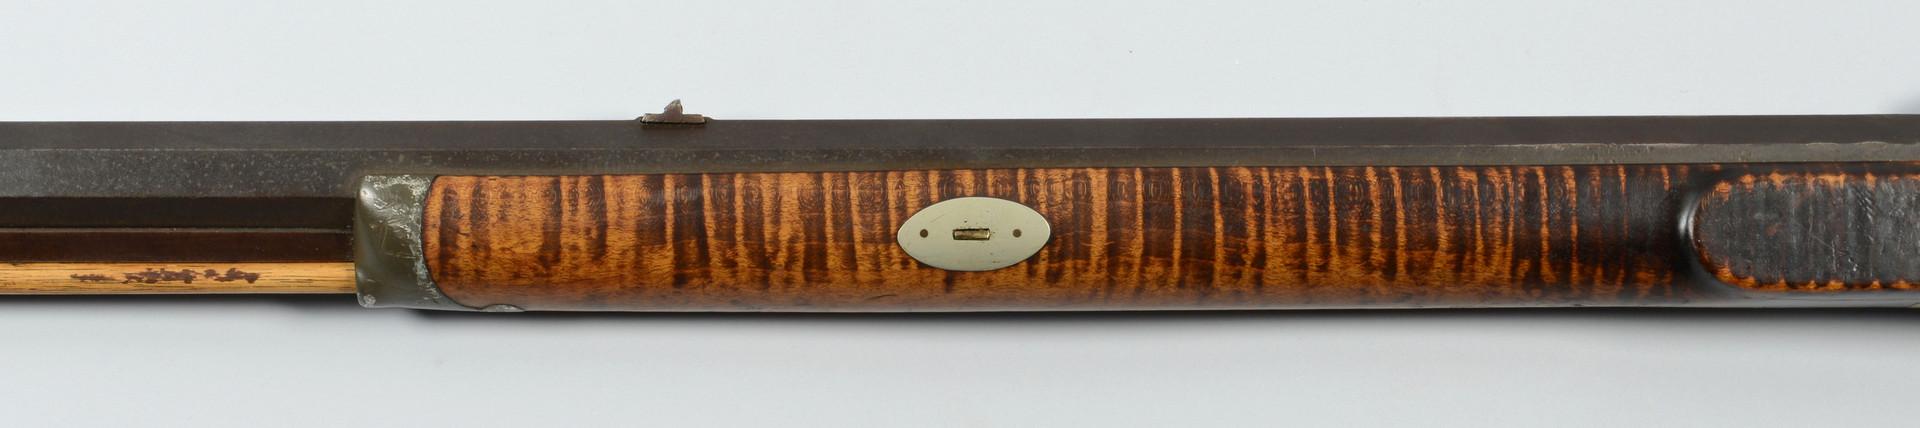 Lot 412: J. S. Burson Percussion Half-Stock Long Rifle